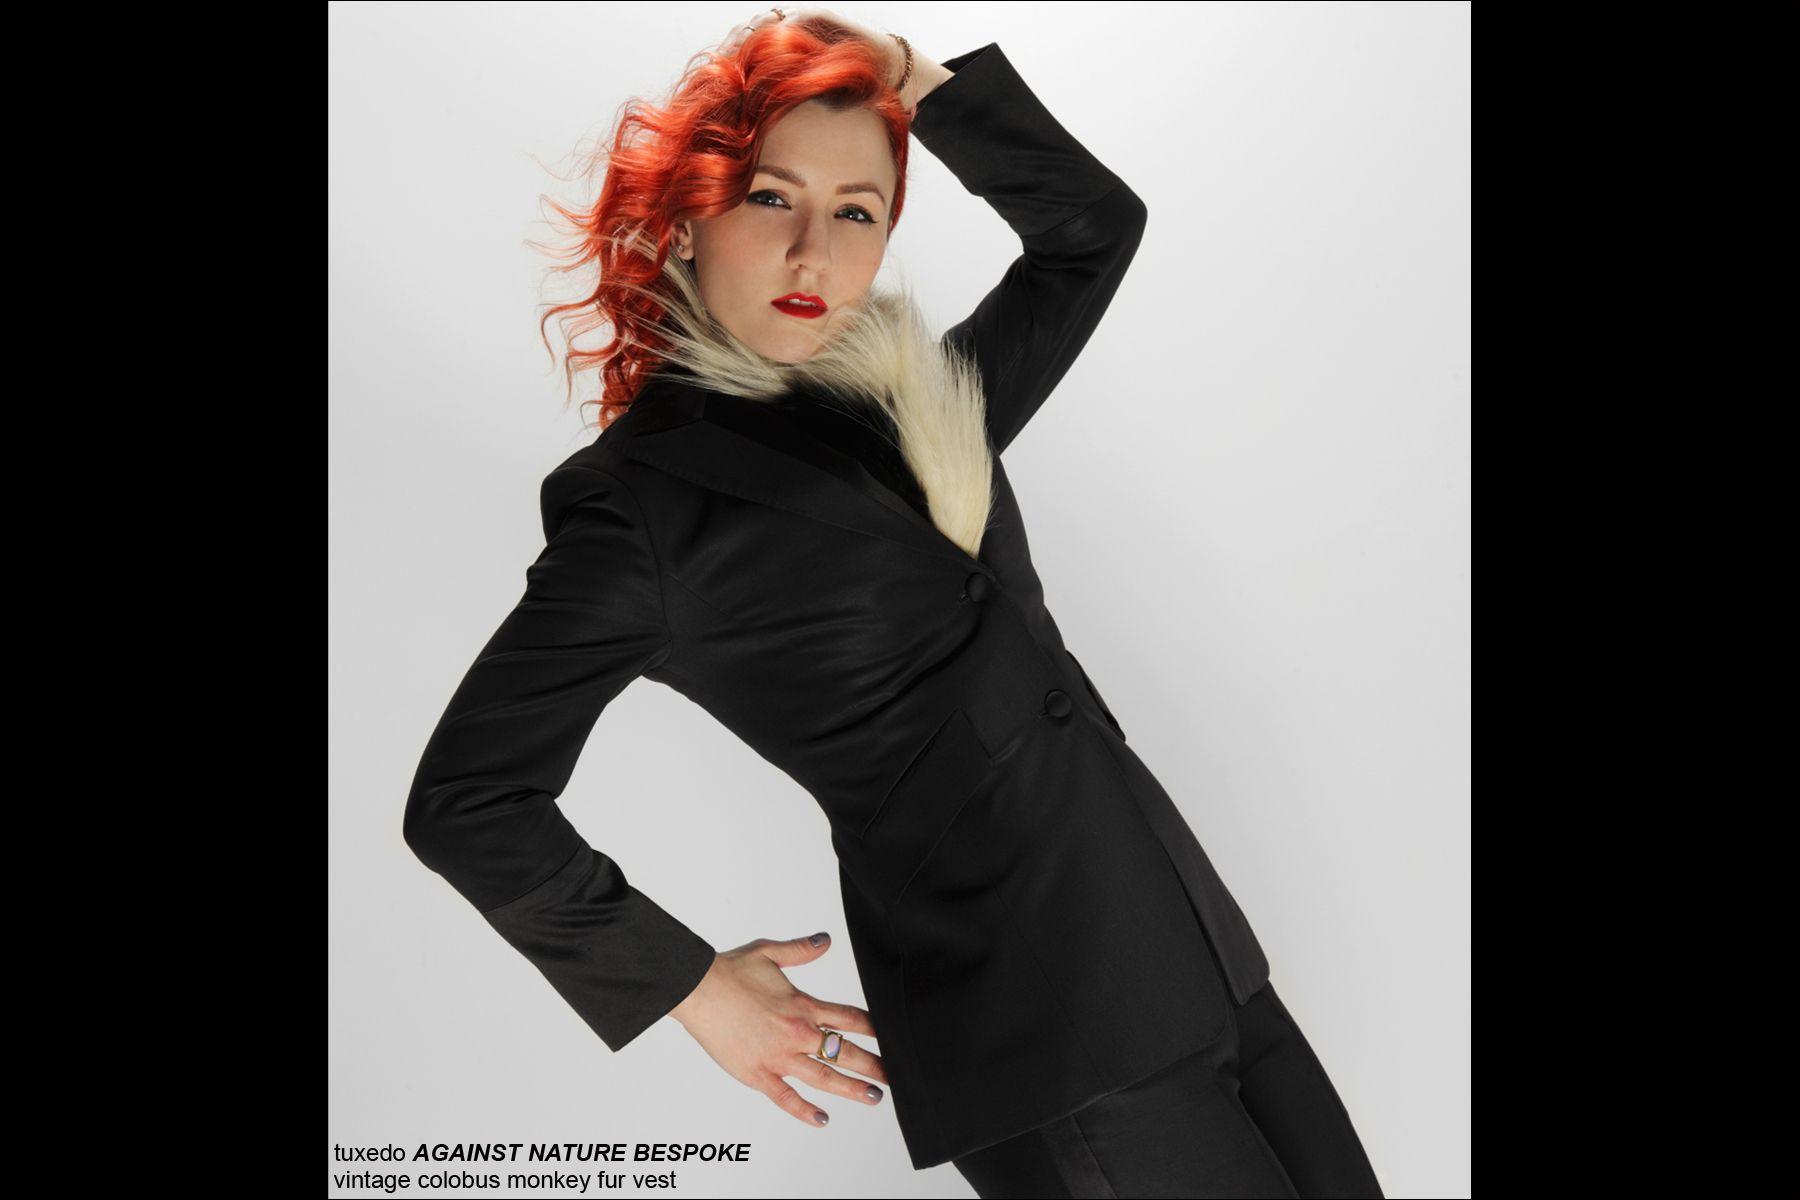 Menswear designer Amber Doyle models for Ponyboy Magazine in New York City, photographed by Alexander Thompson.